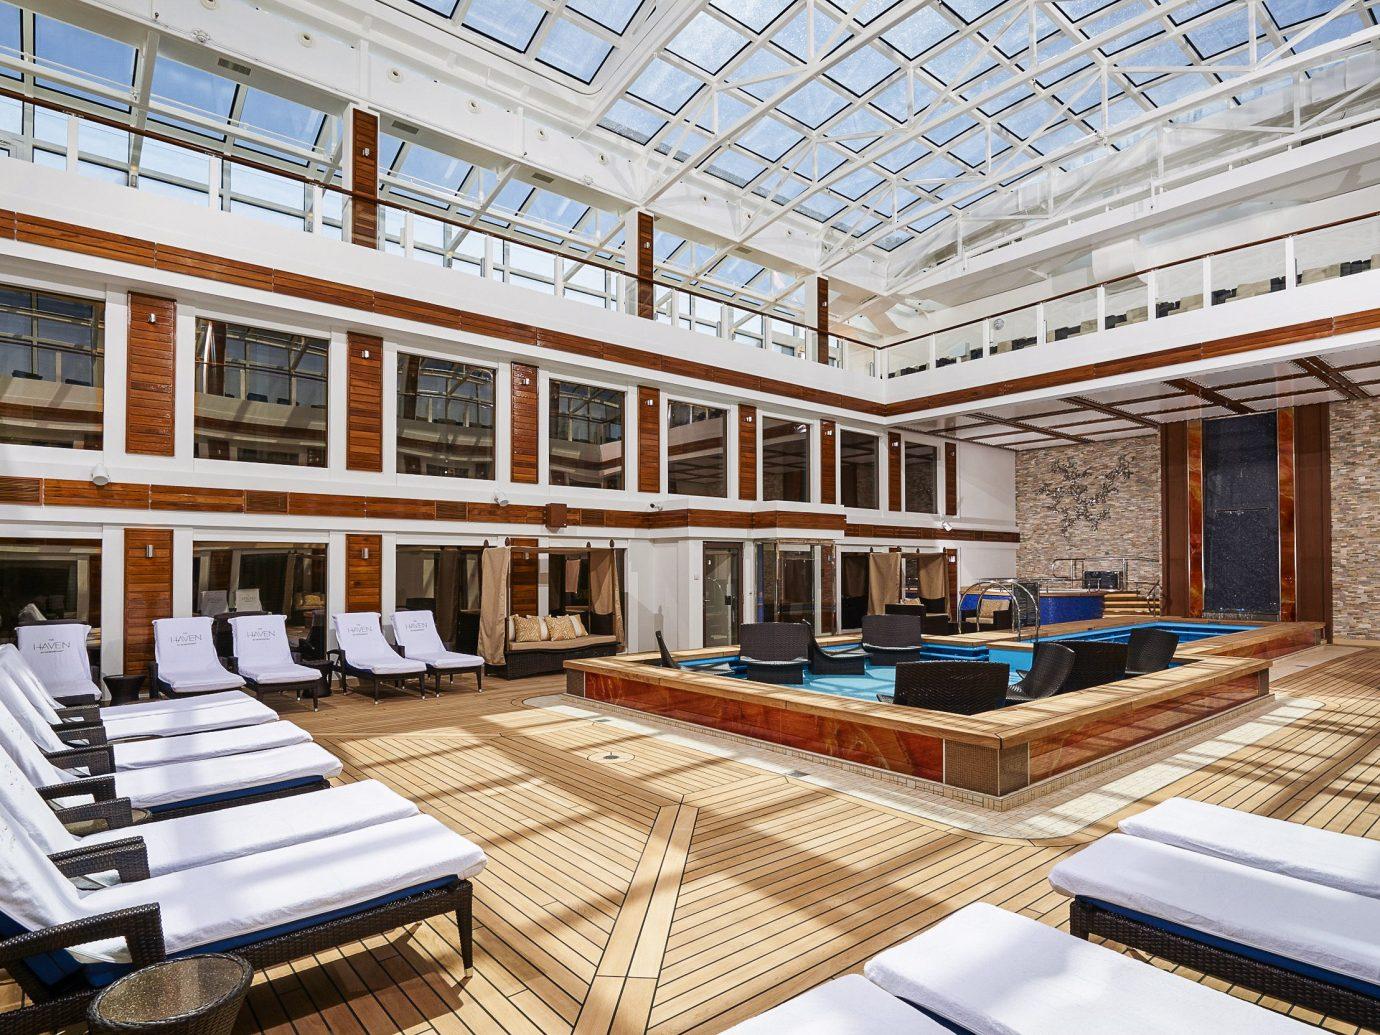 Cruise Travel Luxury Travel Trip Ideas indoor interior design daylighting real estate estate window roof apartment Lobby building furniture